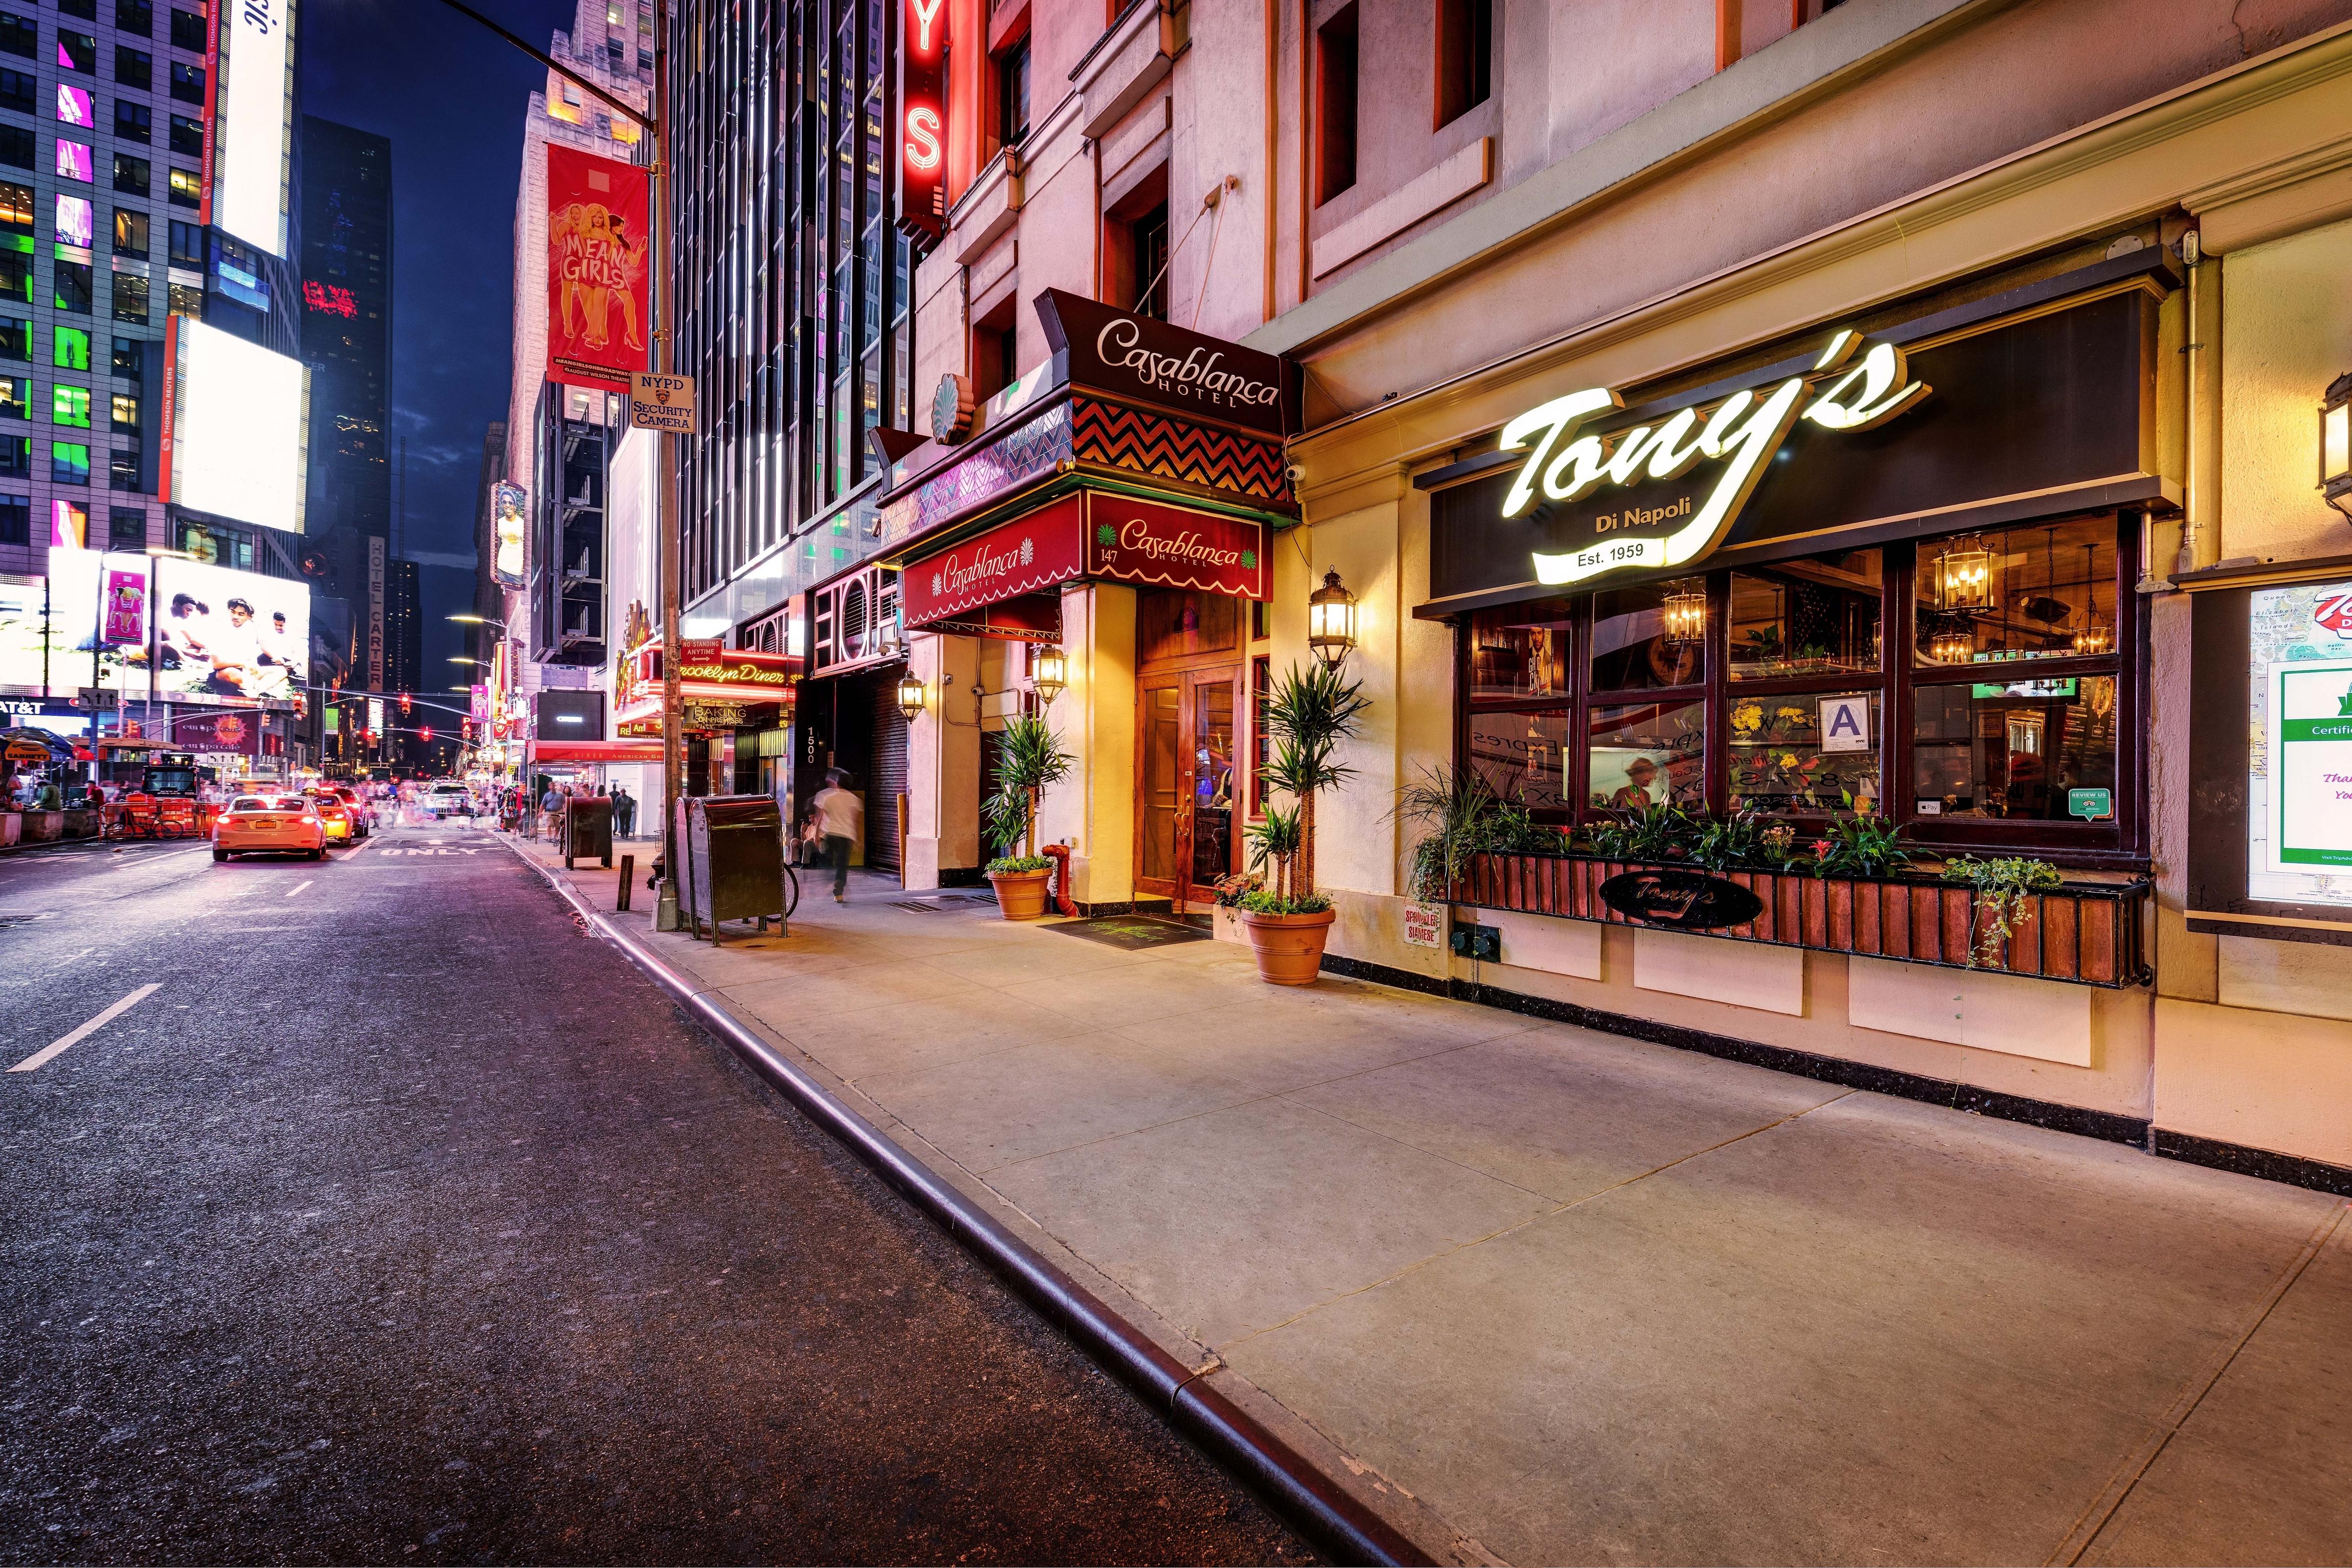 Casablanca Hotel New York City Restaurants Midtown Manhattan Dining